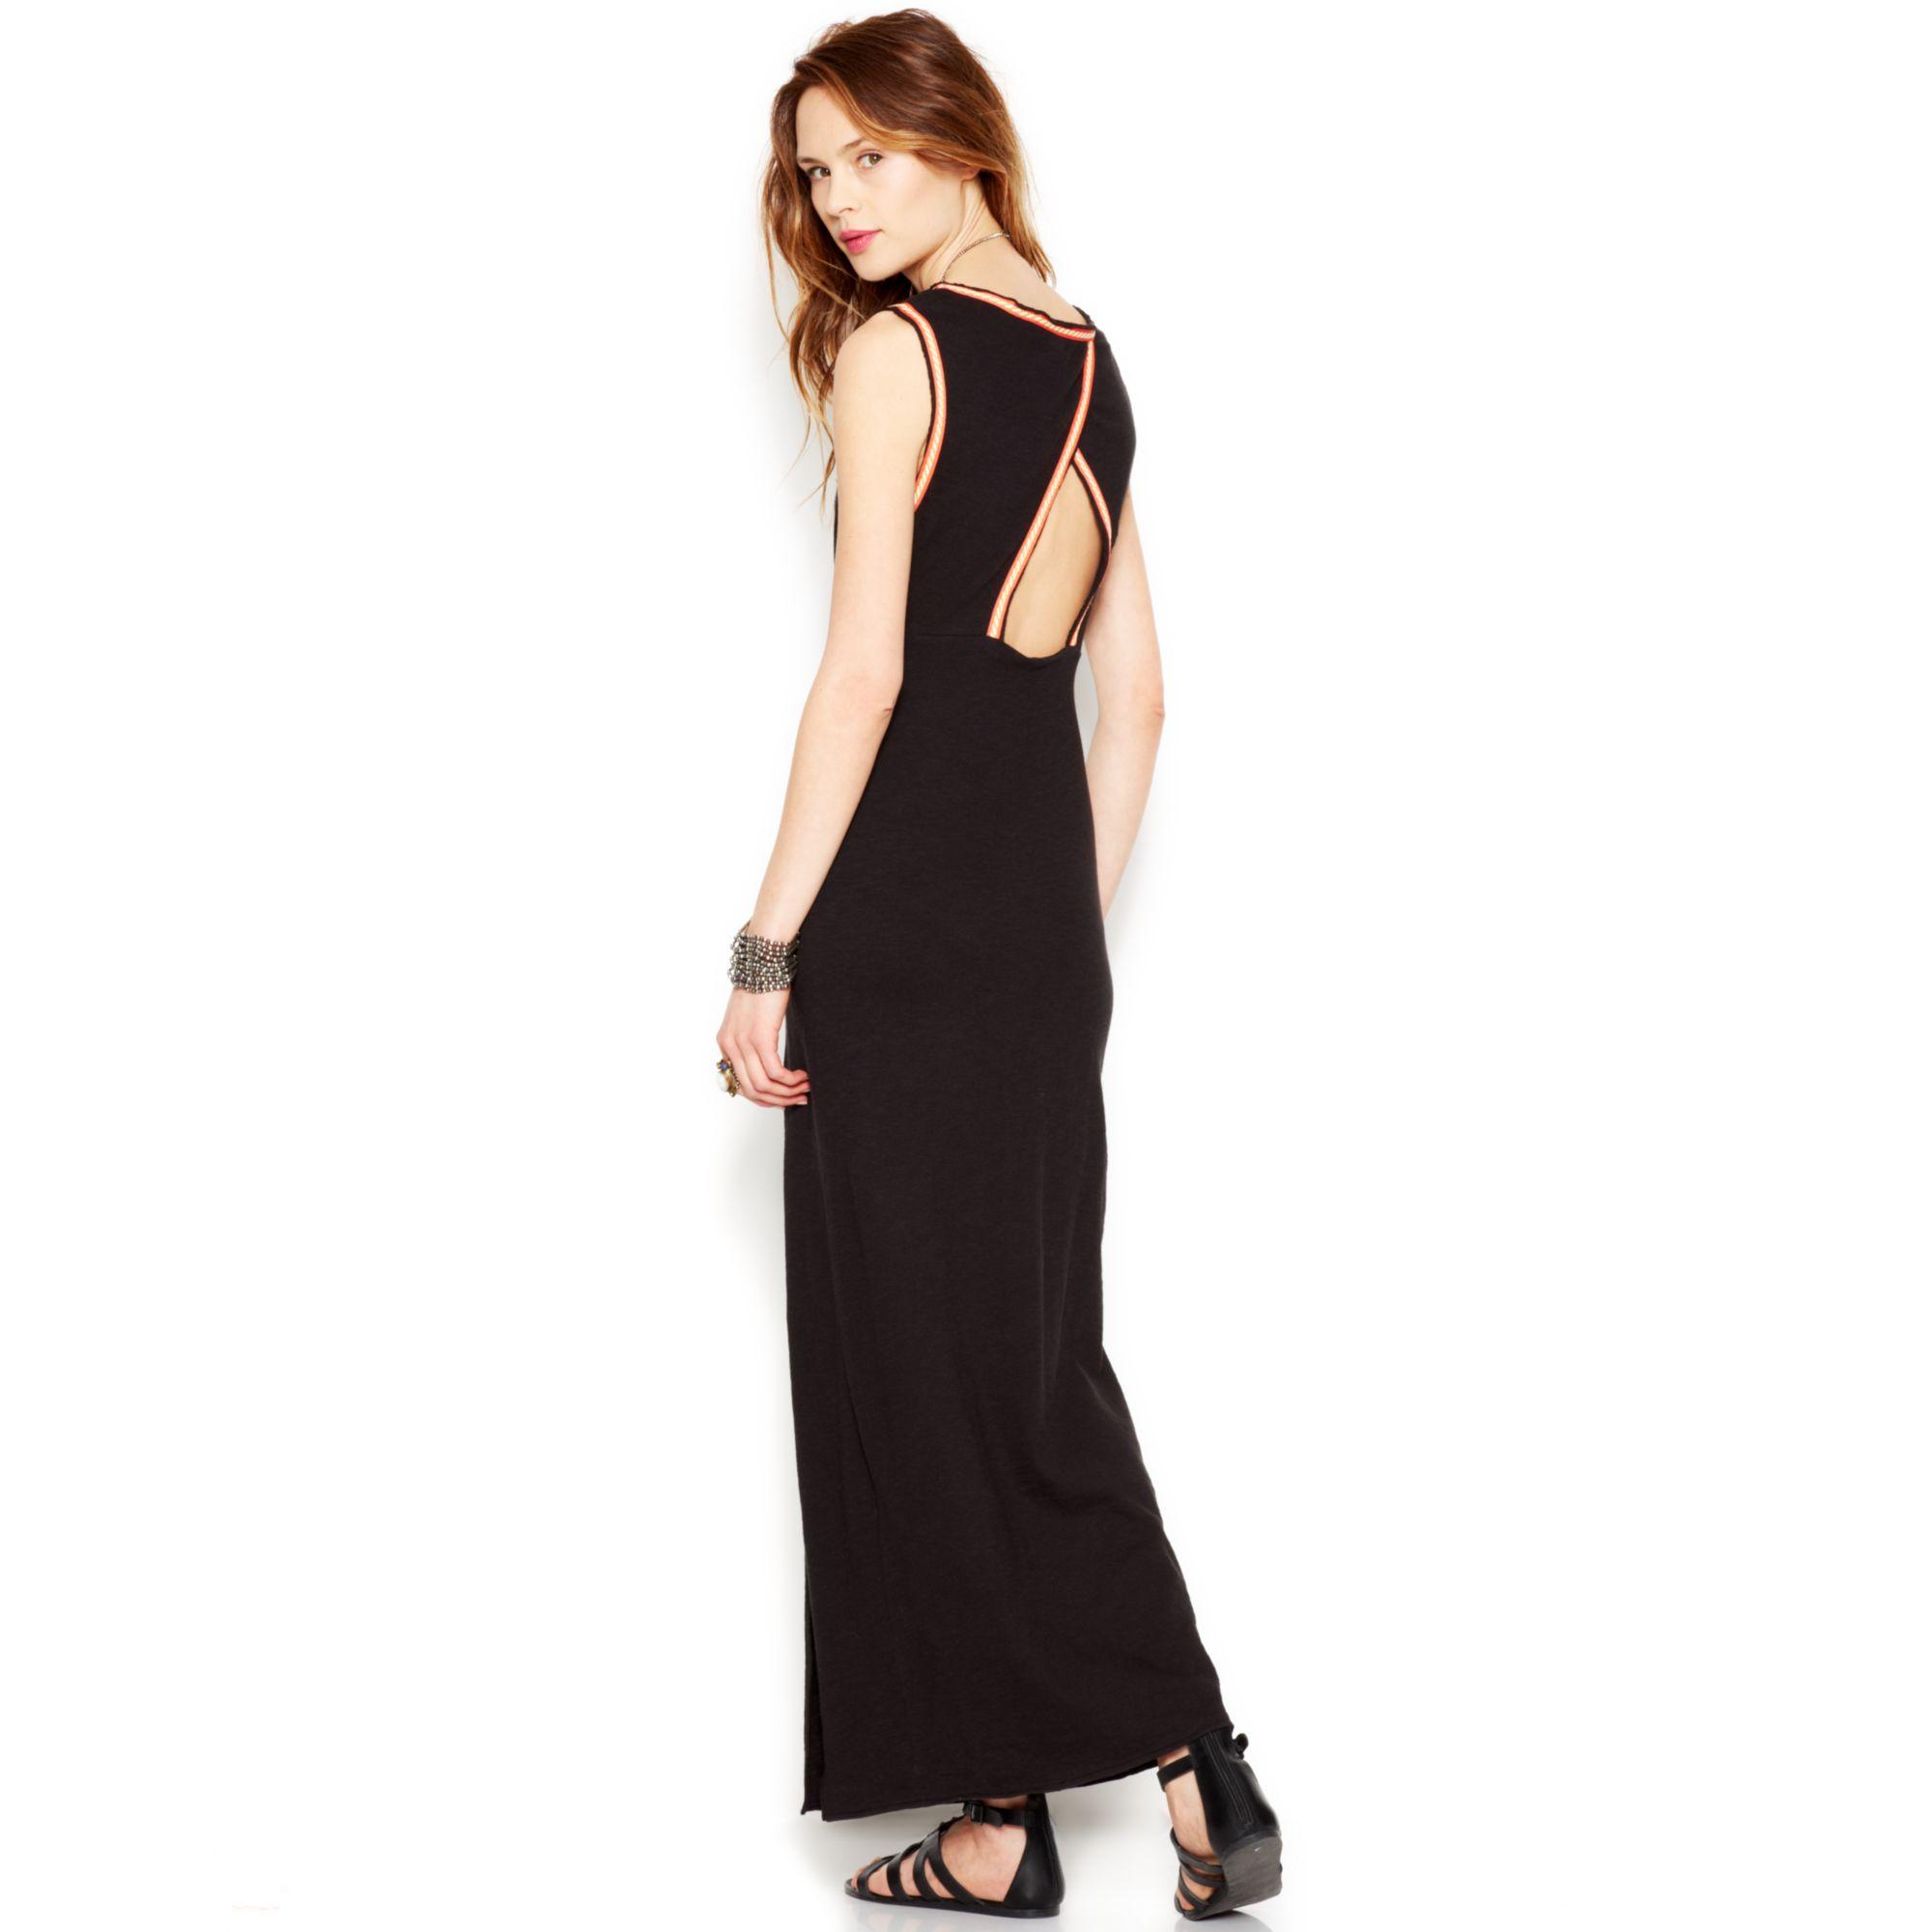 ee002bc73840d Lyst - Free People Sabrina Maxi Dress in Black